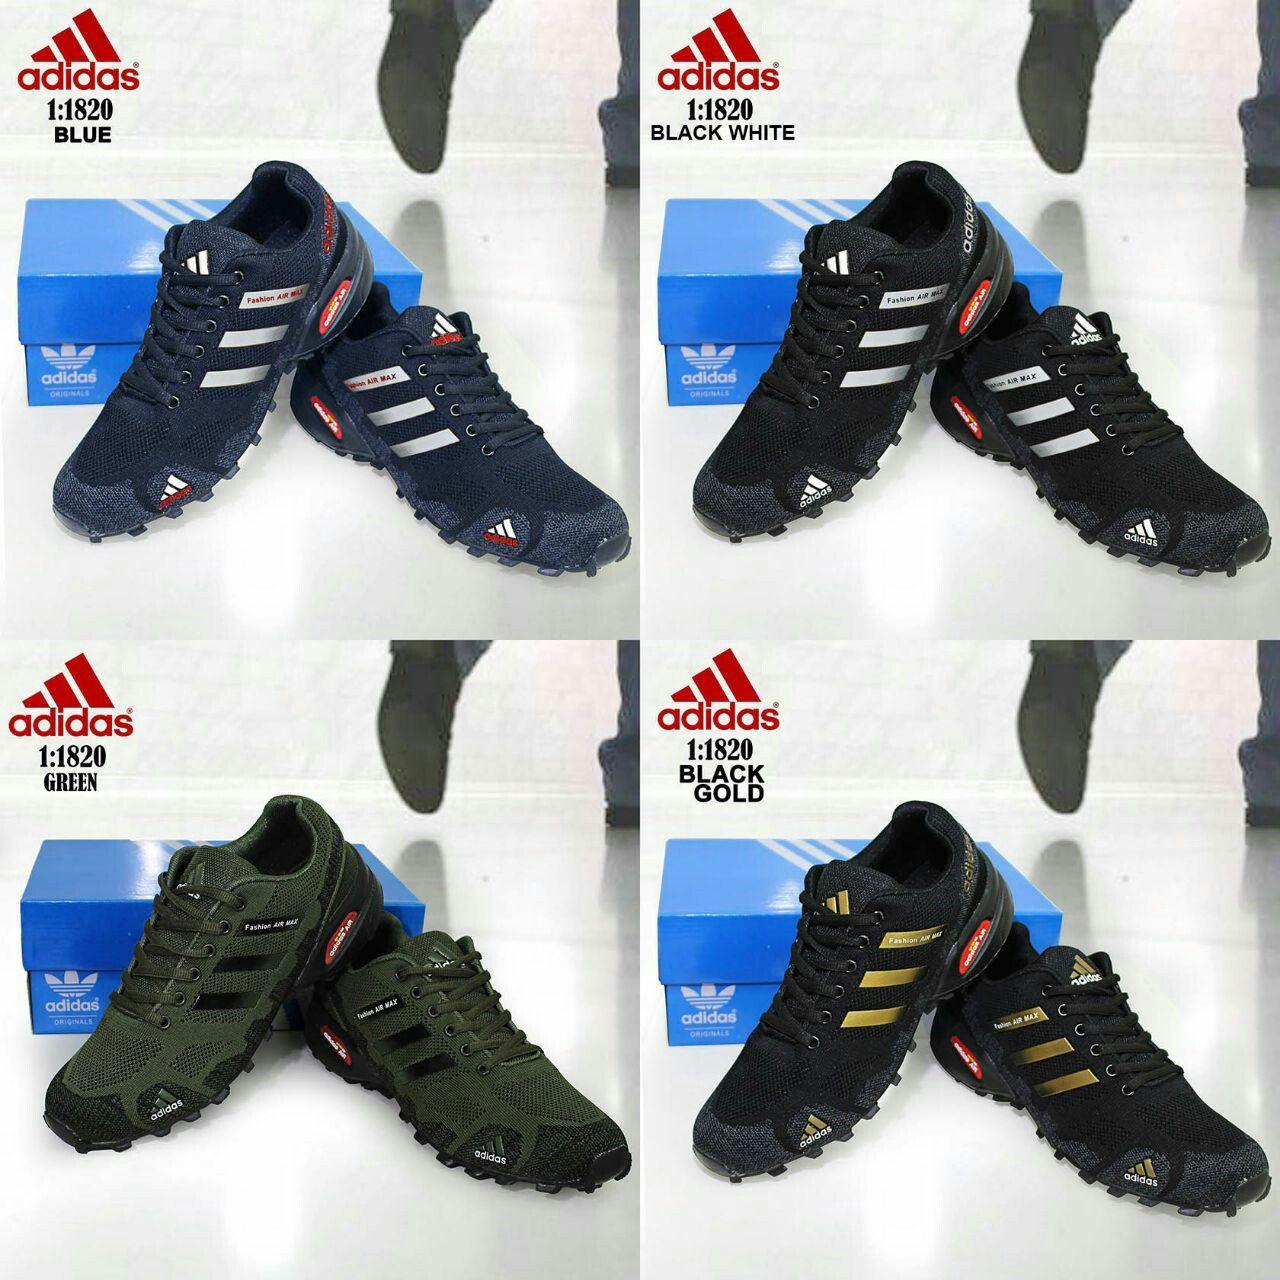 Sepatu Merek Adidas Seri 1820 Kualitas Semprem Tinggi Tumit 4cm